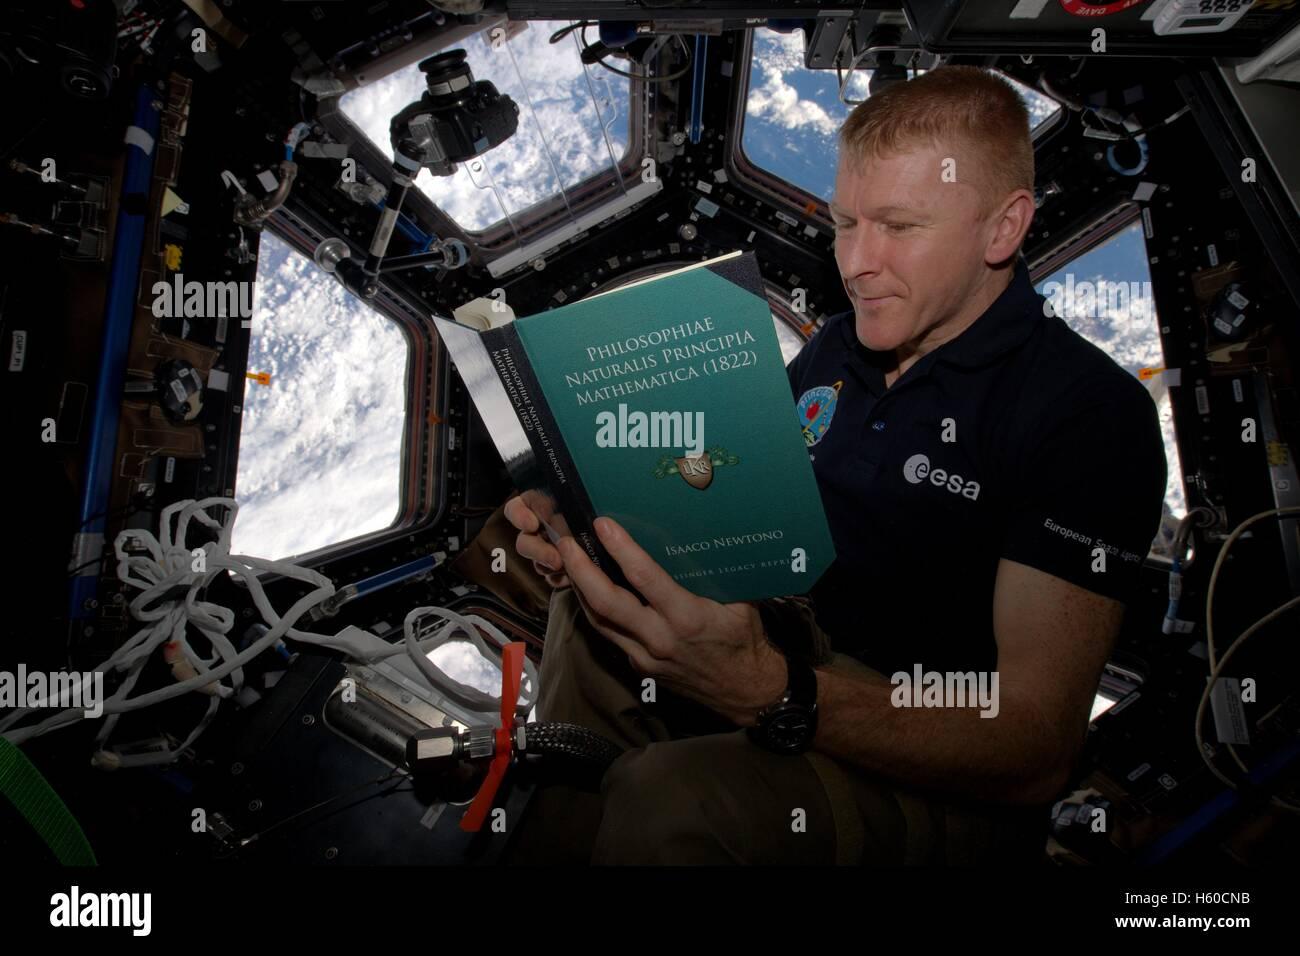 NASA International Space Station Expedition 46 British astronaut Tim Peake reads Principe Mathematica by Isaac Newton - Stock Image